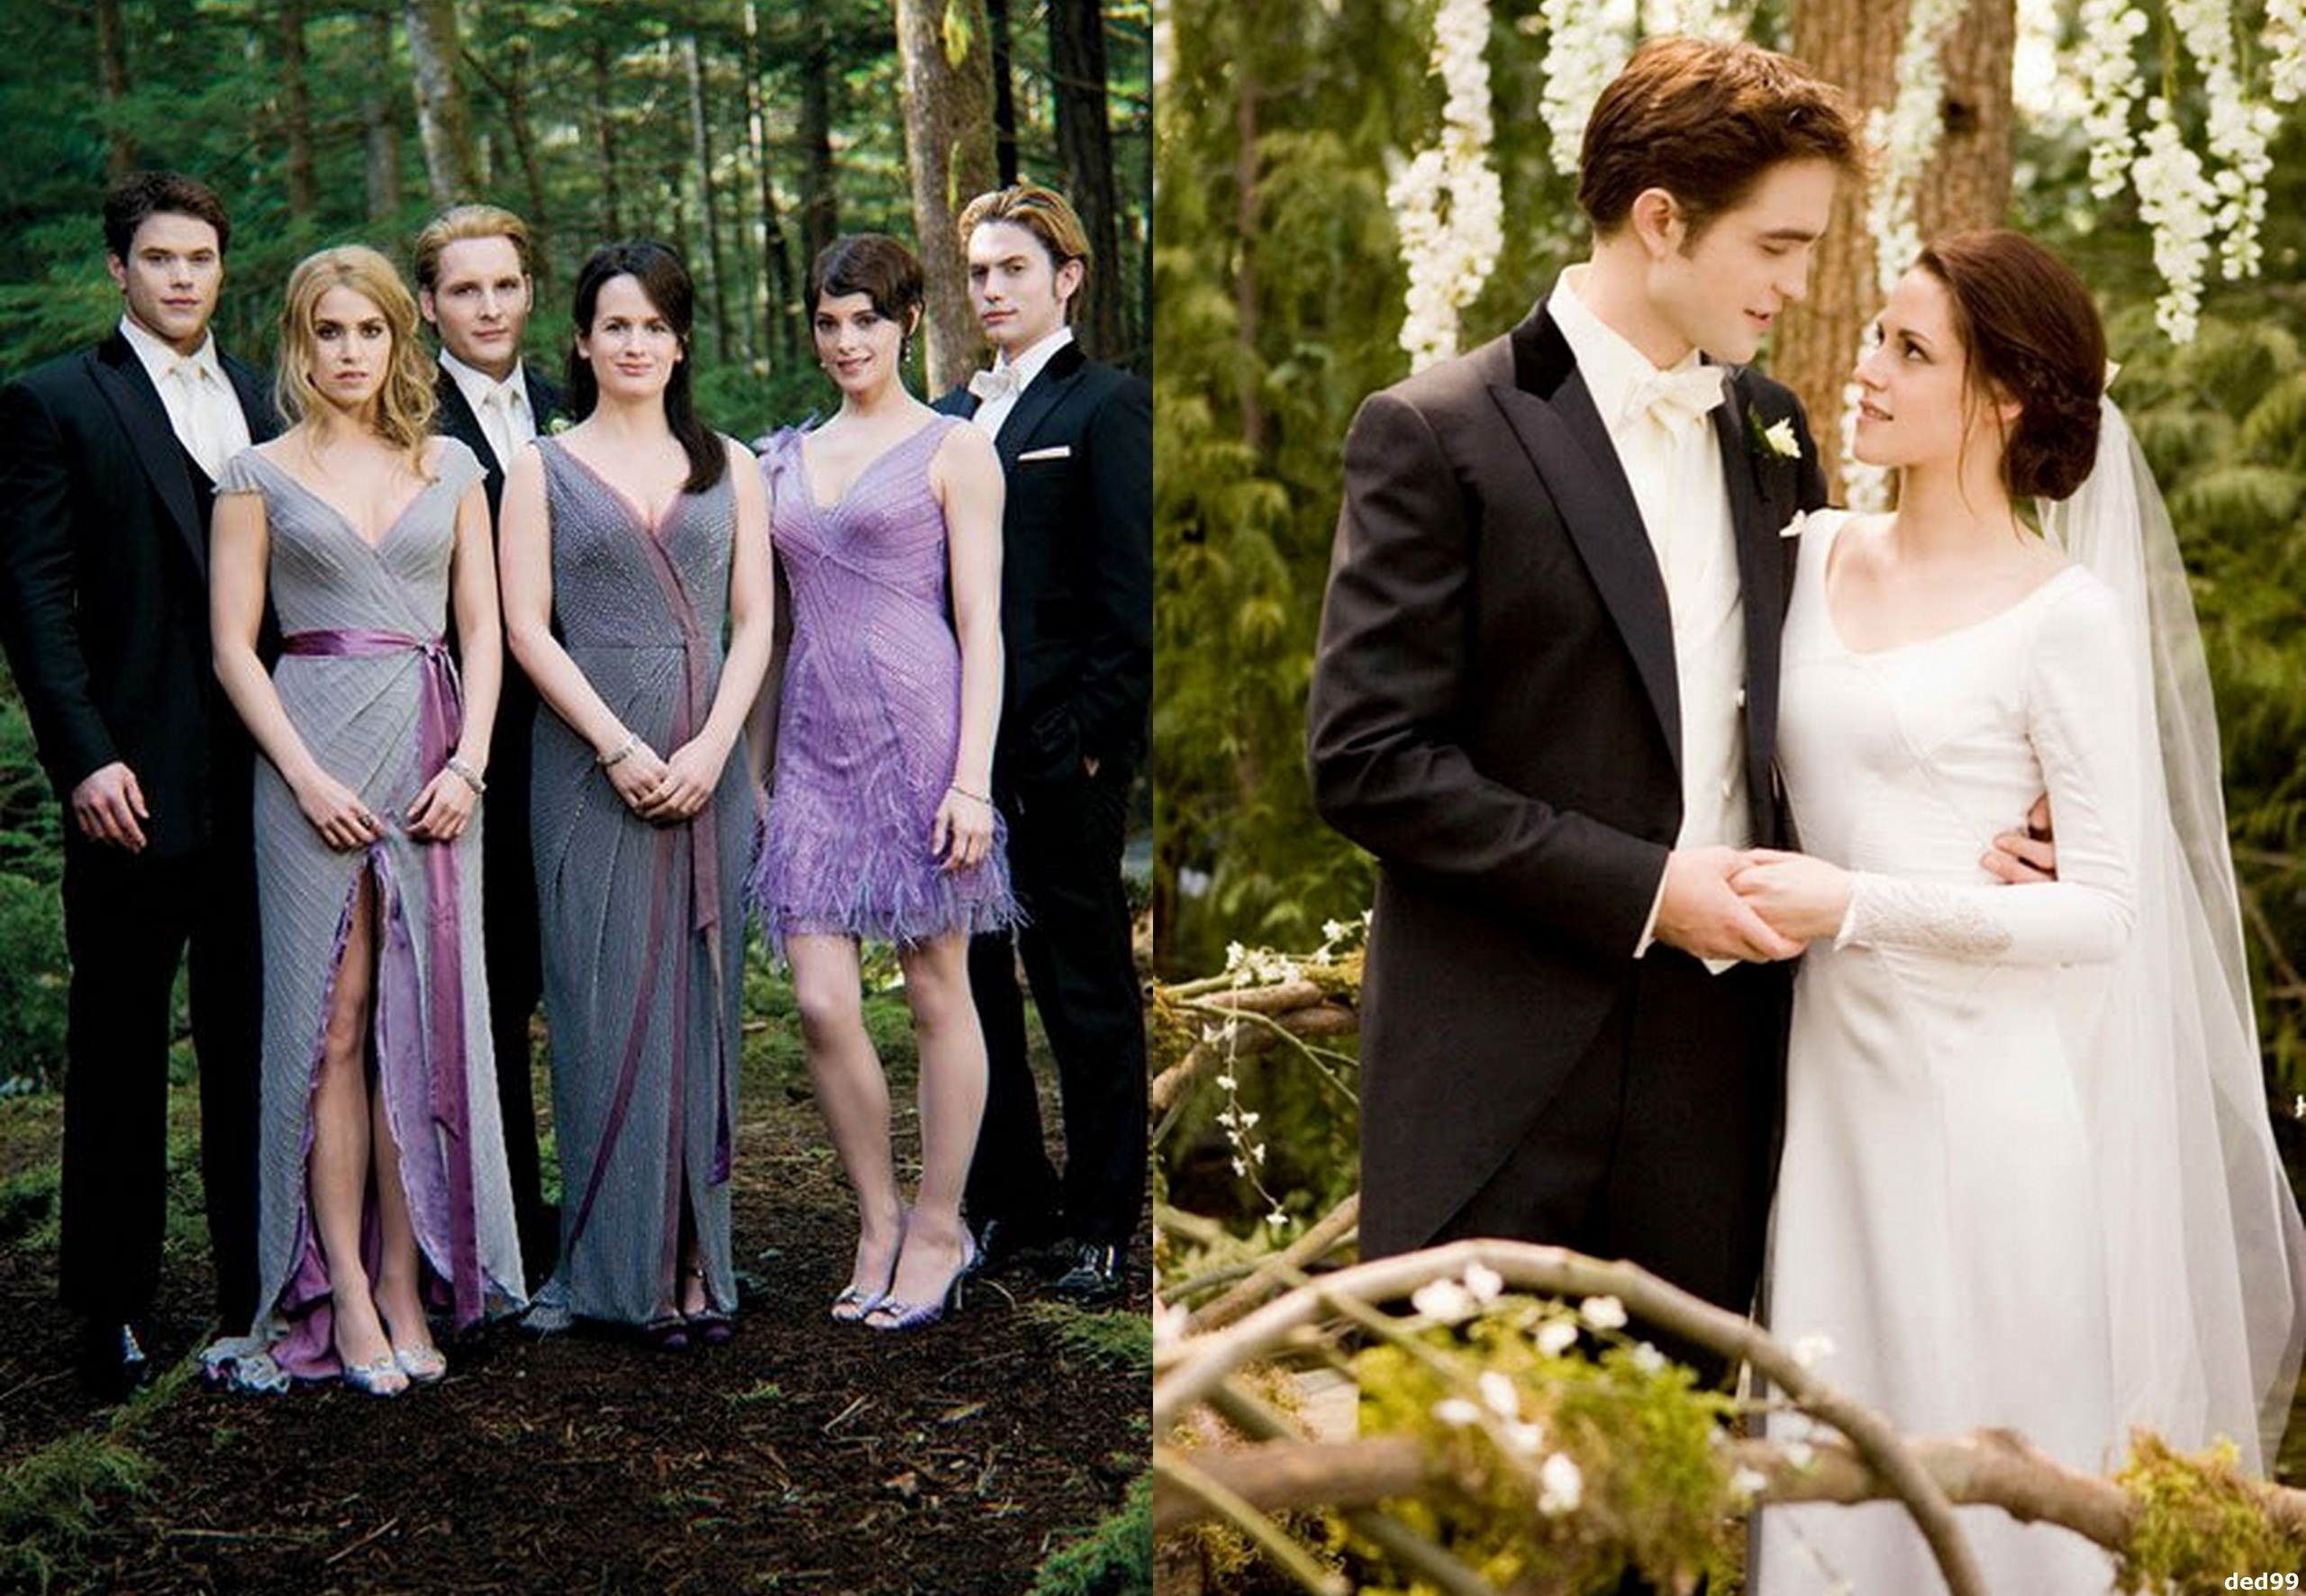 Cullens Breaking Dawn Part1